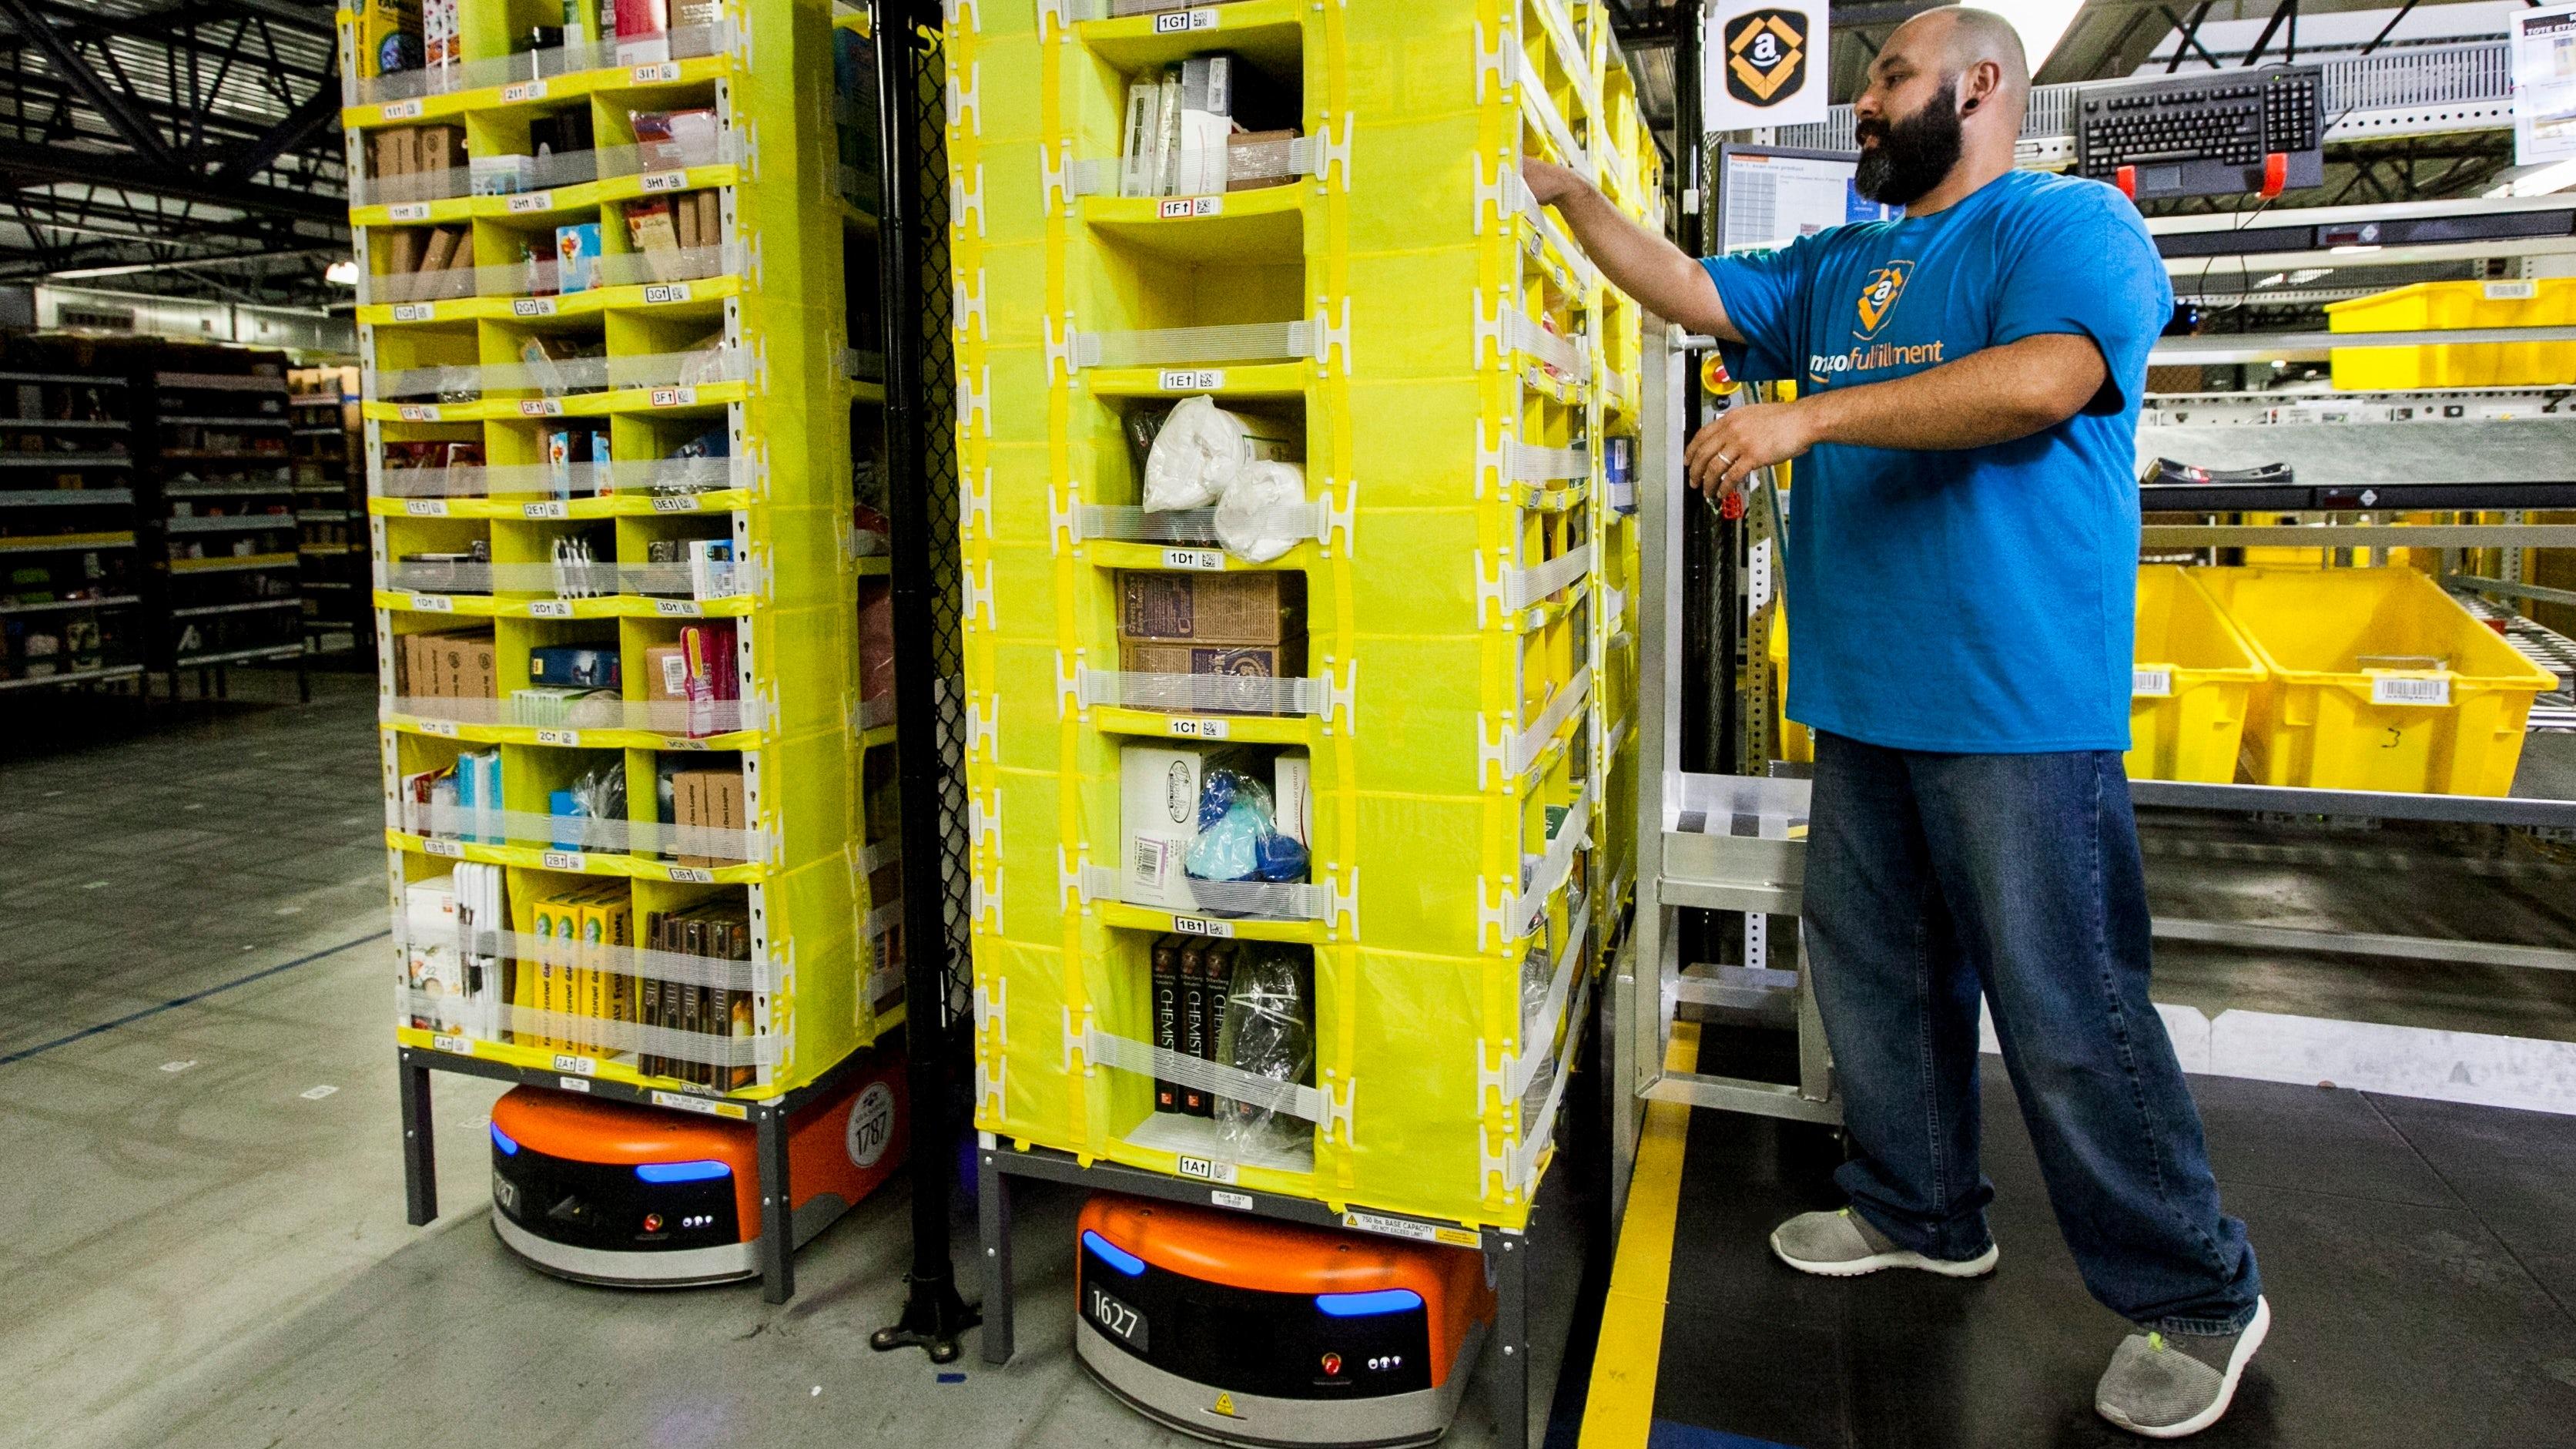 Employee picking with Amazon Robotics | Source: Amazon Press Centre